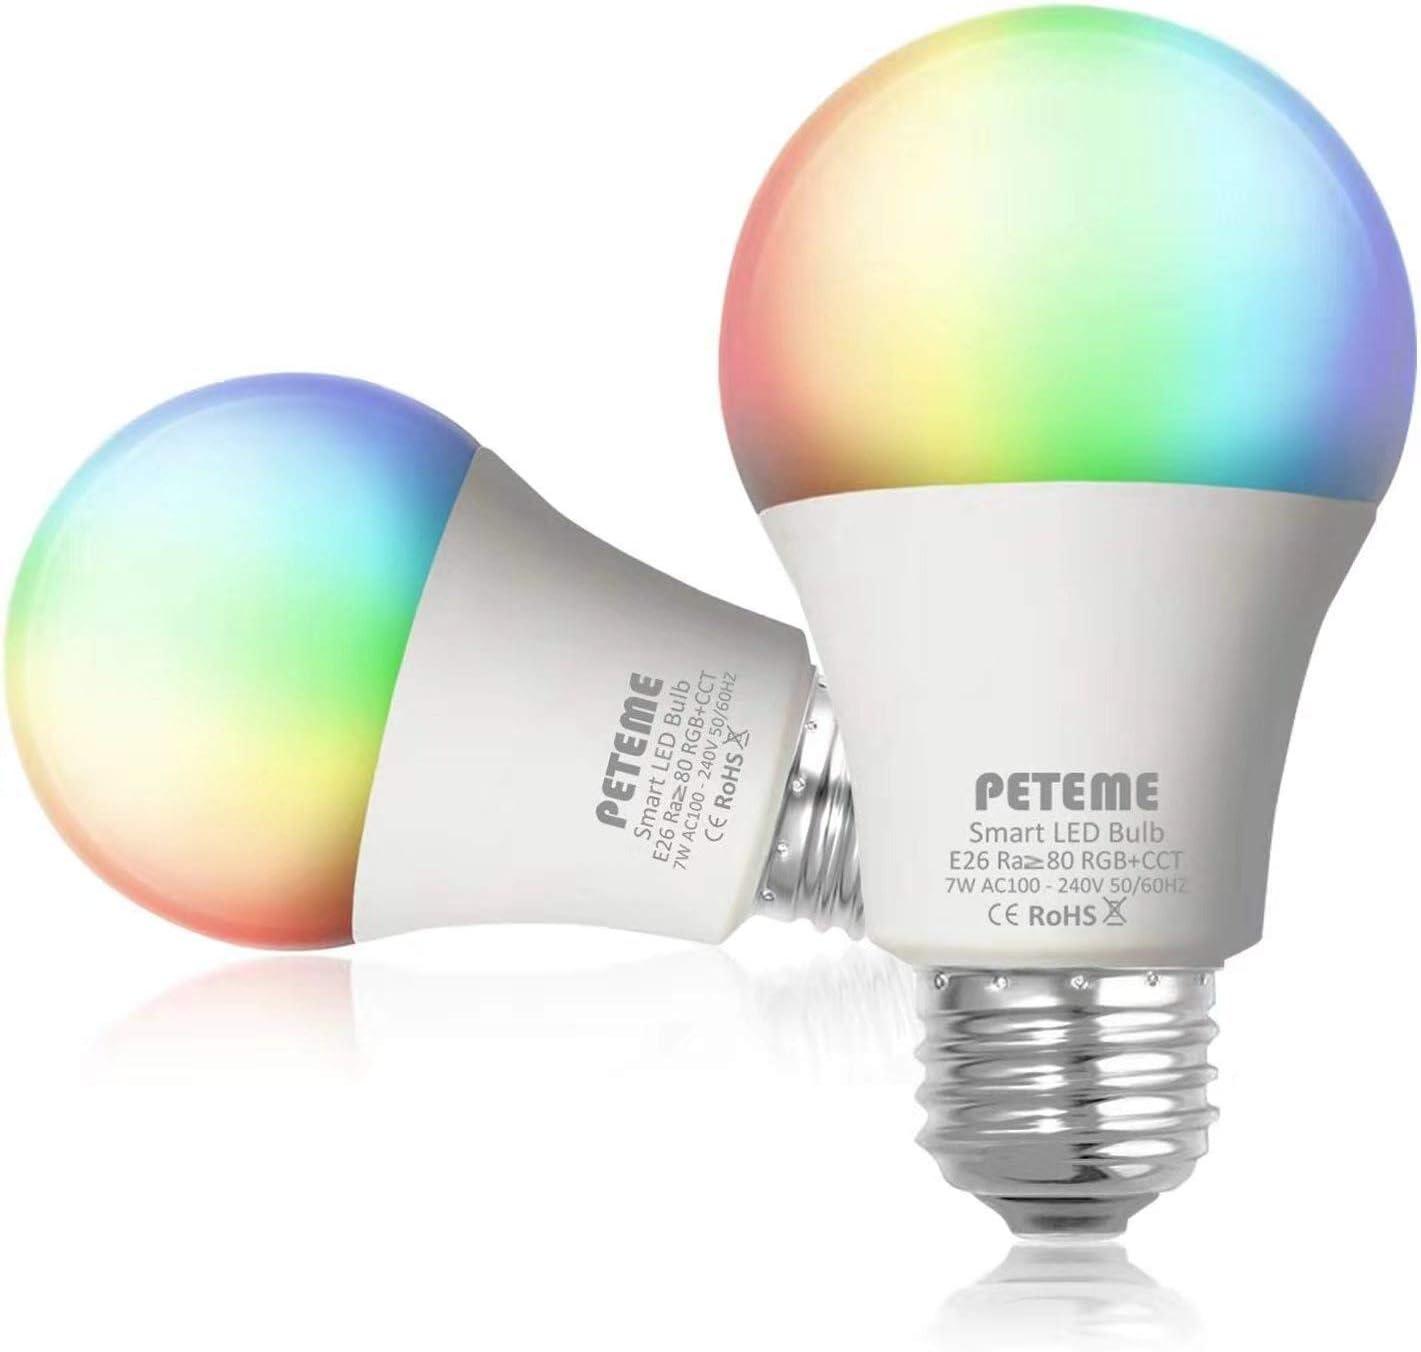 Peteme Smart Alexa Light Bulb 2.4G not 5G E26 Multicolor WiFi Light Bulb